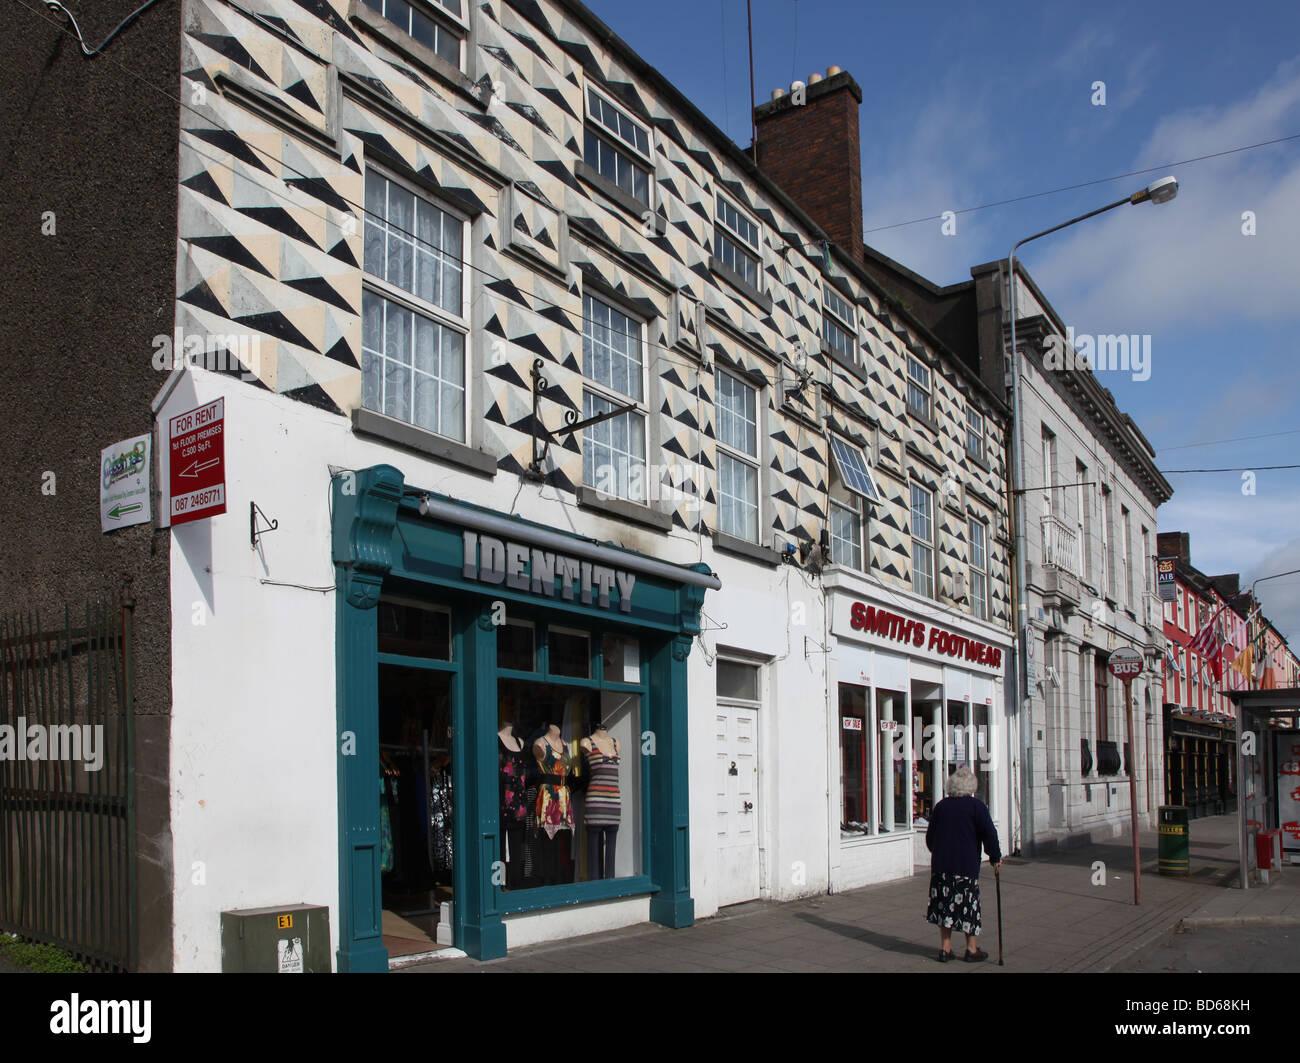 Kitsch trompe l oeil shopfront Carrickmacross Co Monaghan - Stock Image